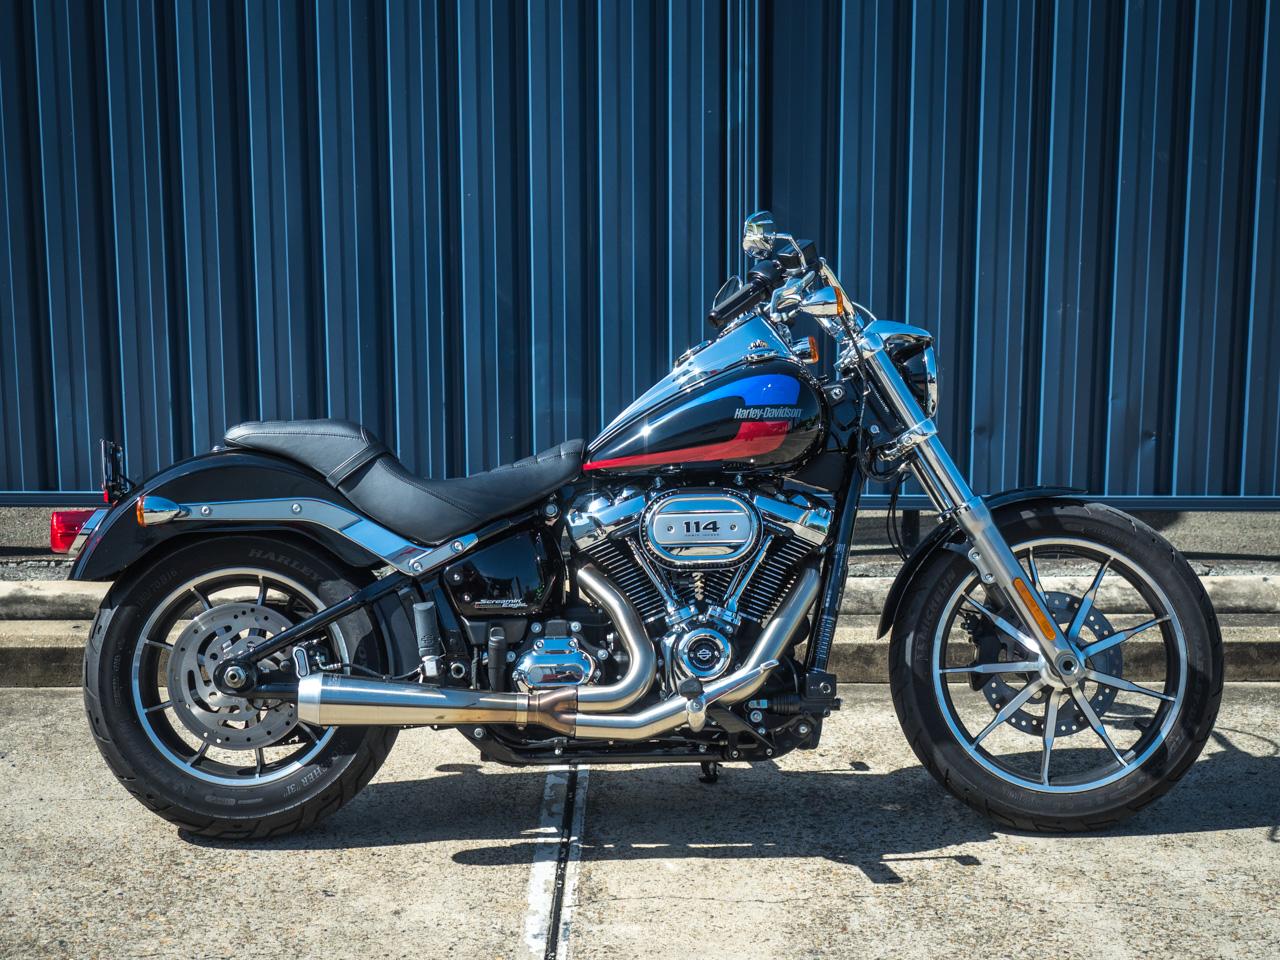 Harley Davidson: Harley-Davidson FXLR Low Rider 114 2018 ⋆ Motorcycles R Us